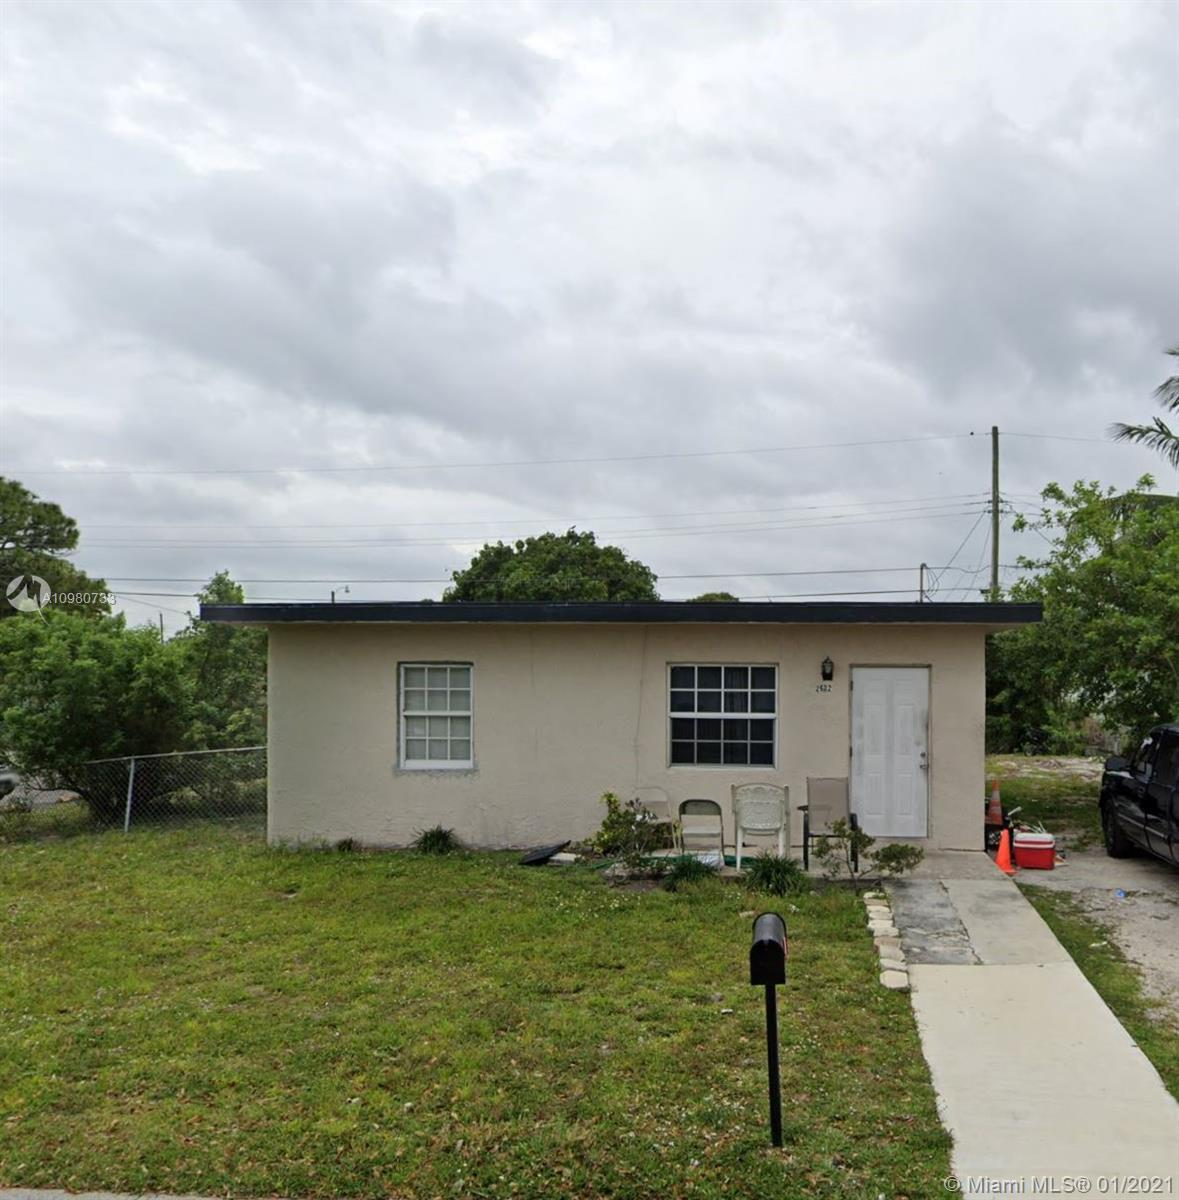 2602 NW 9th Ct, Pompano Beach, Florida 33069